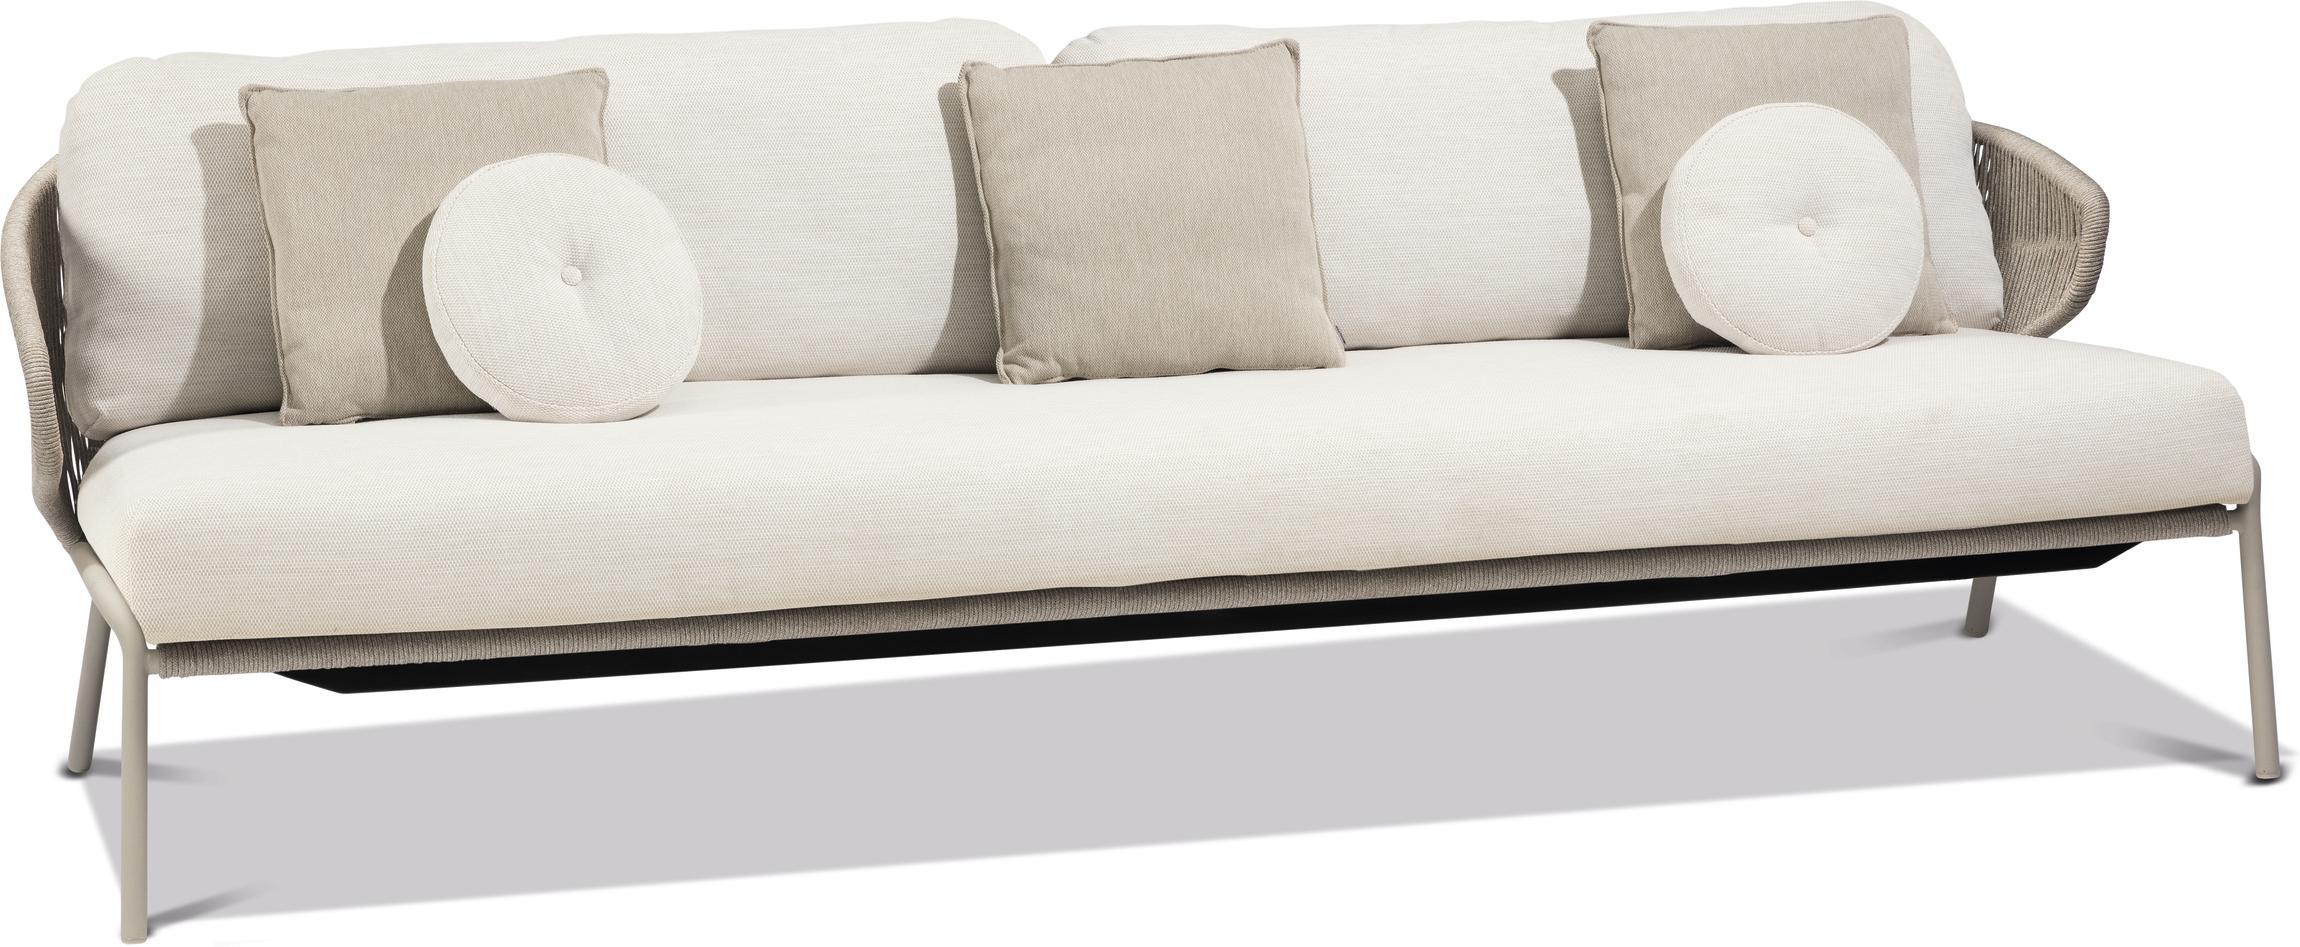 Radius 3 posti - divano fisso - selce - pepe